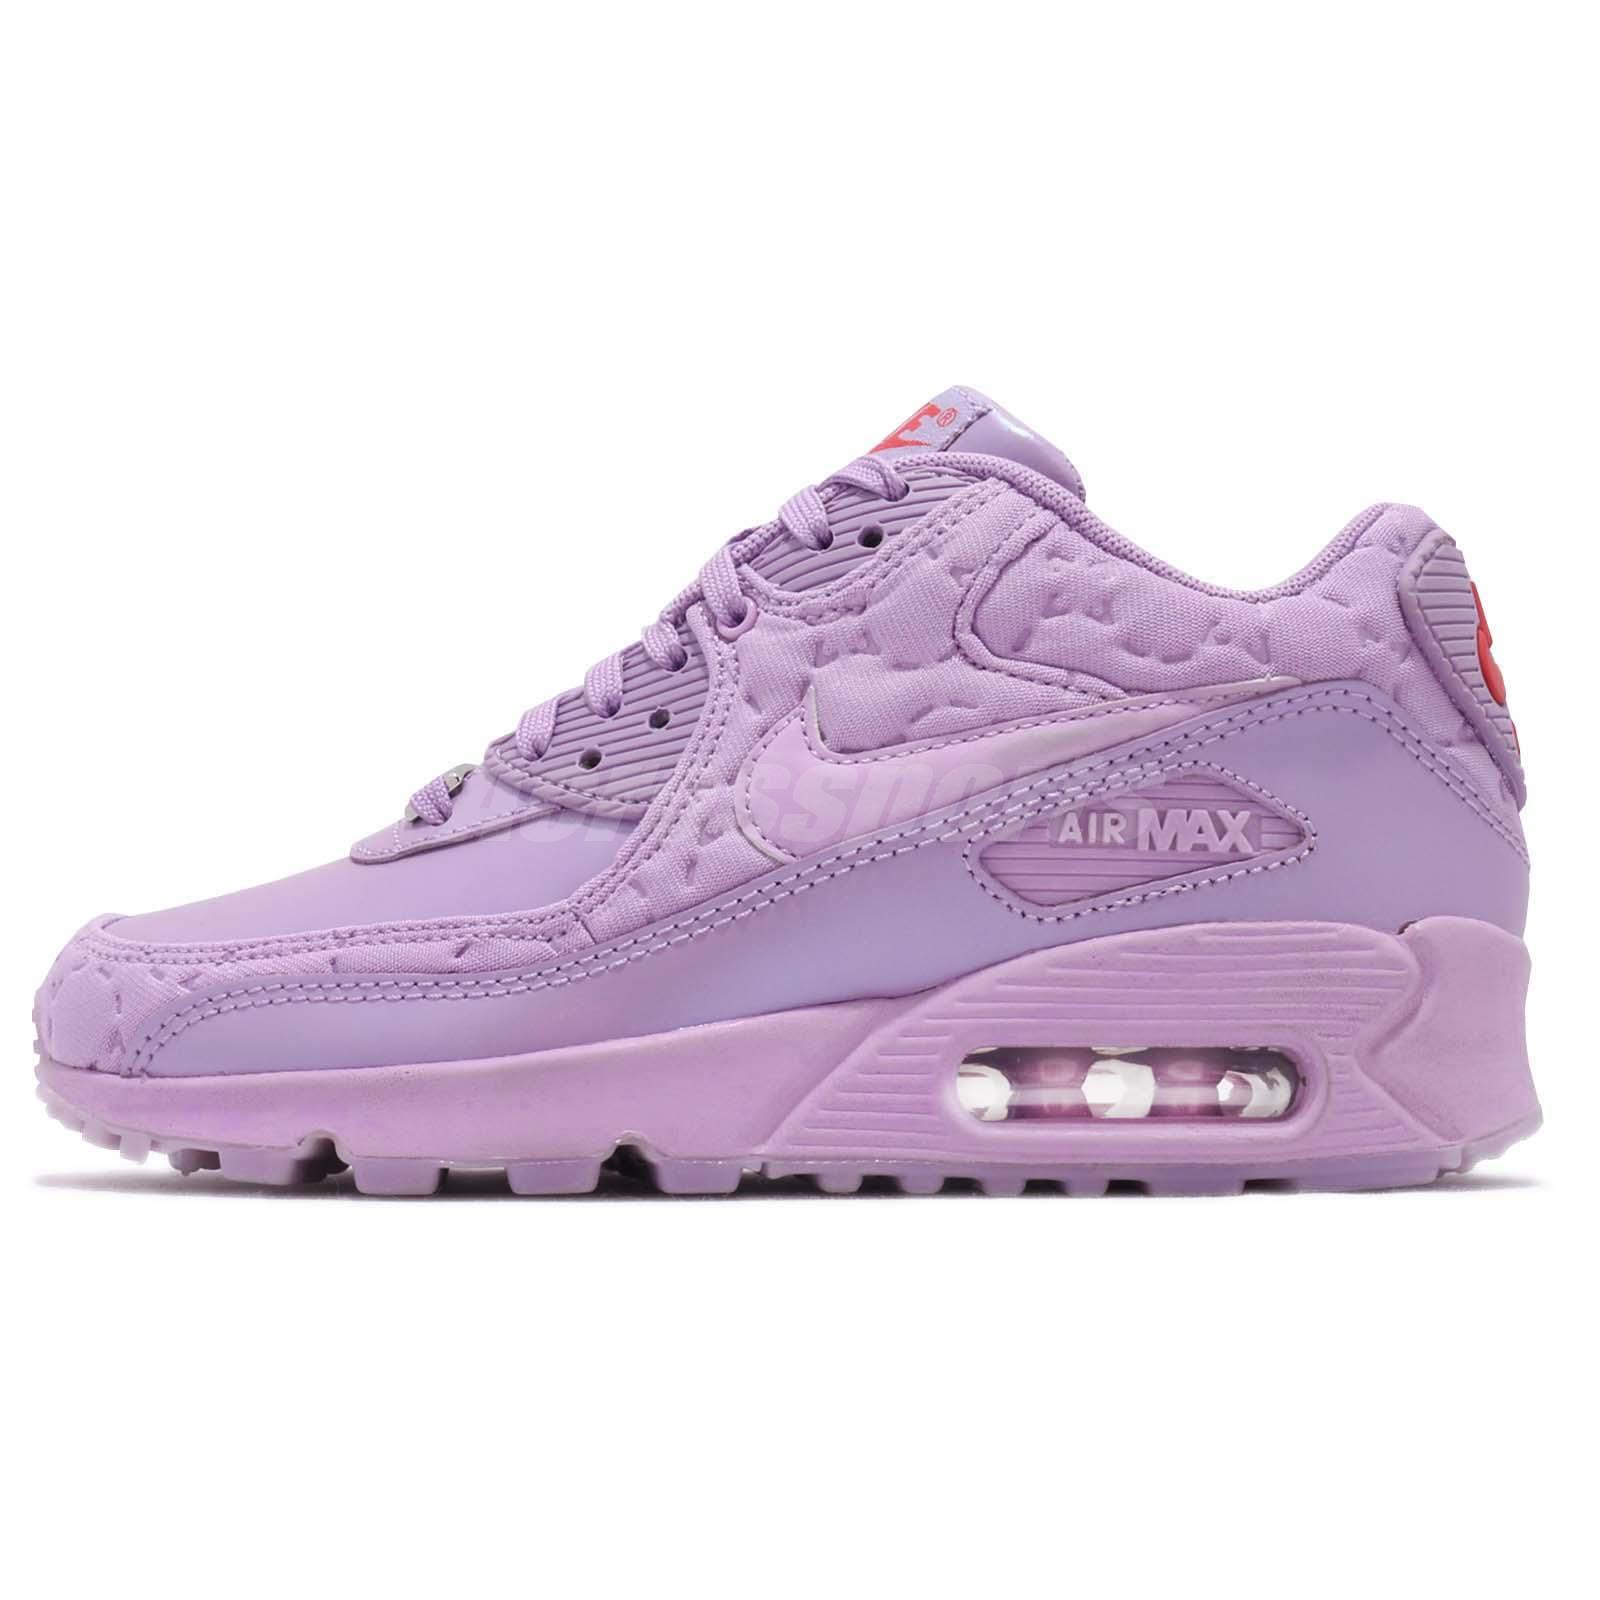 new arrival b6358 d0ce5 ... discount code for nike wmns air max 90 qs paris macaron purple women  running shoes 813150